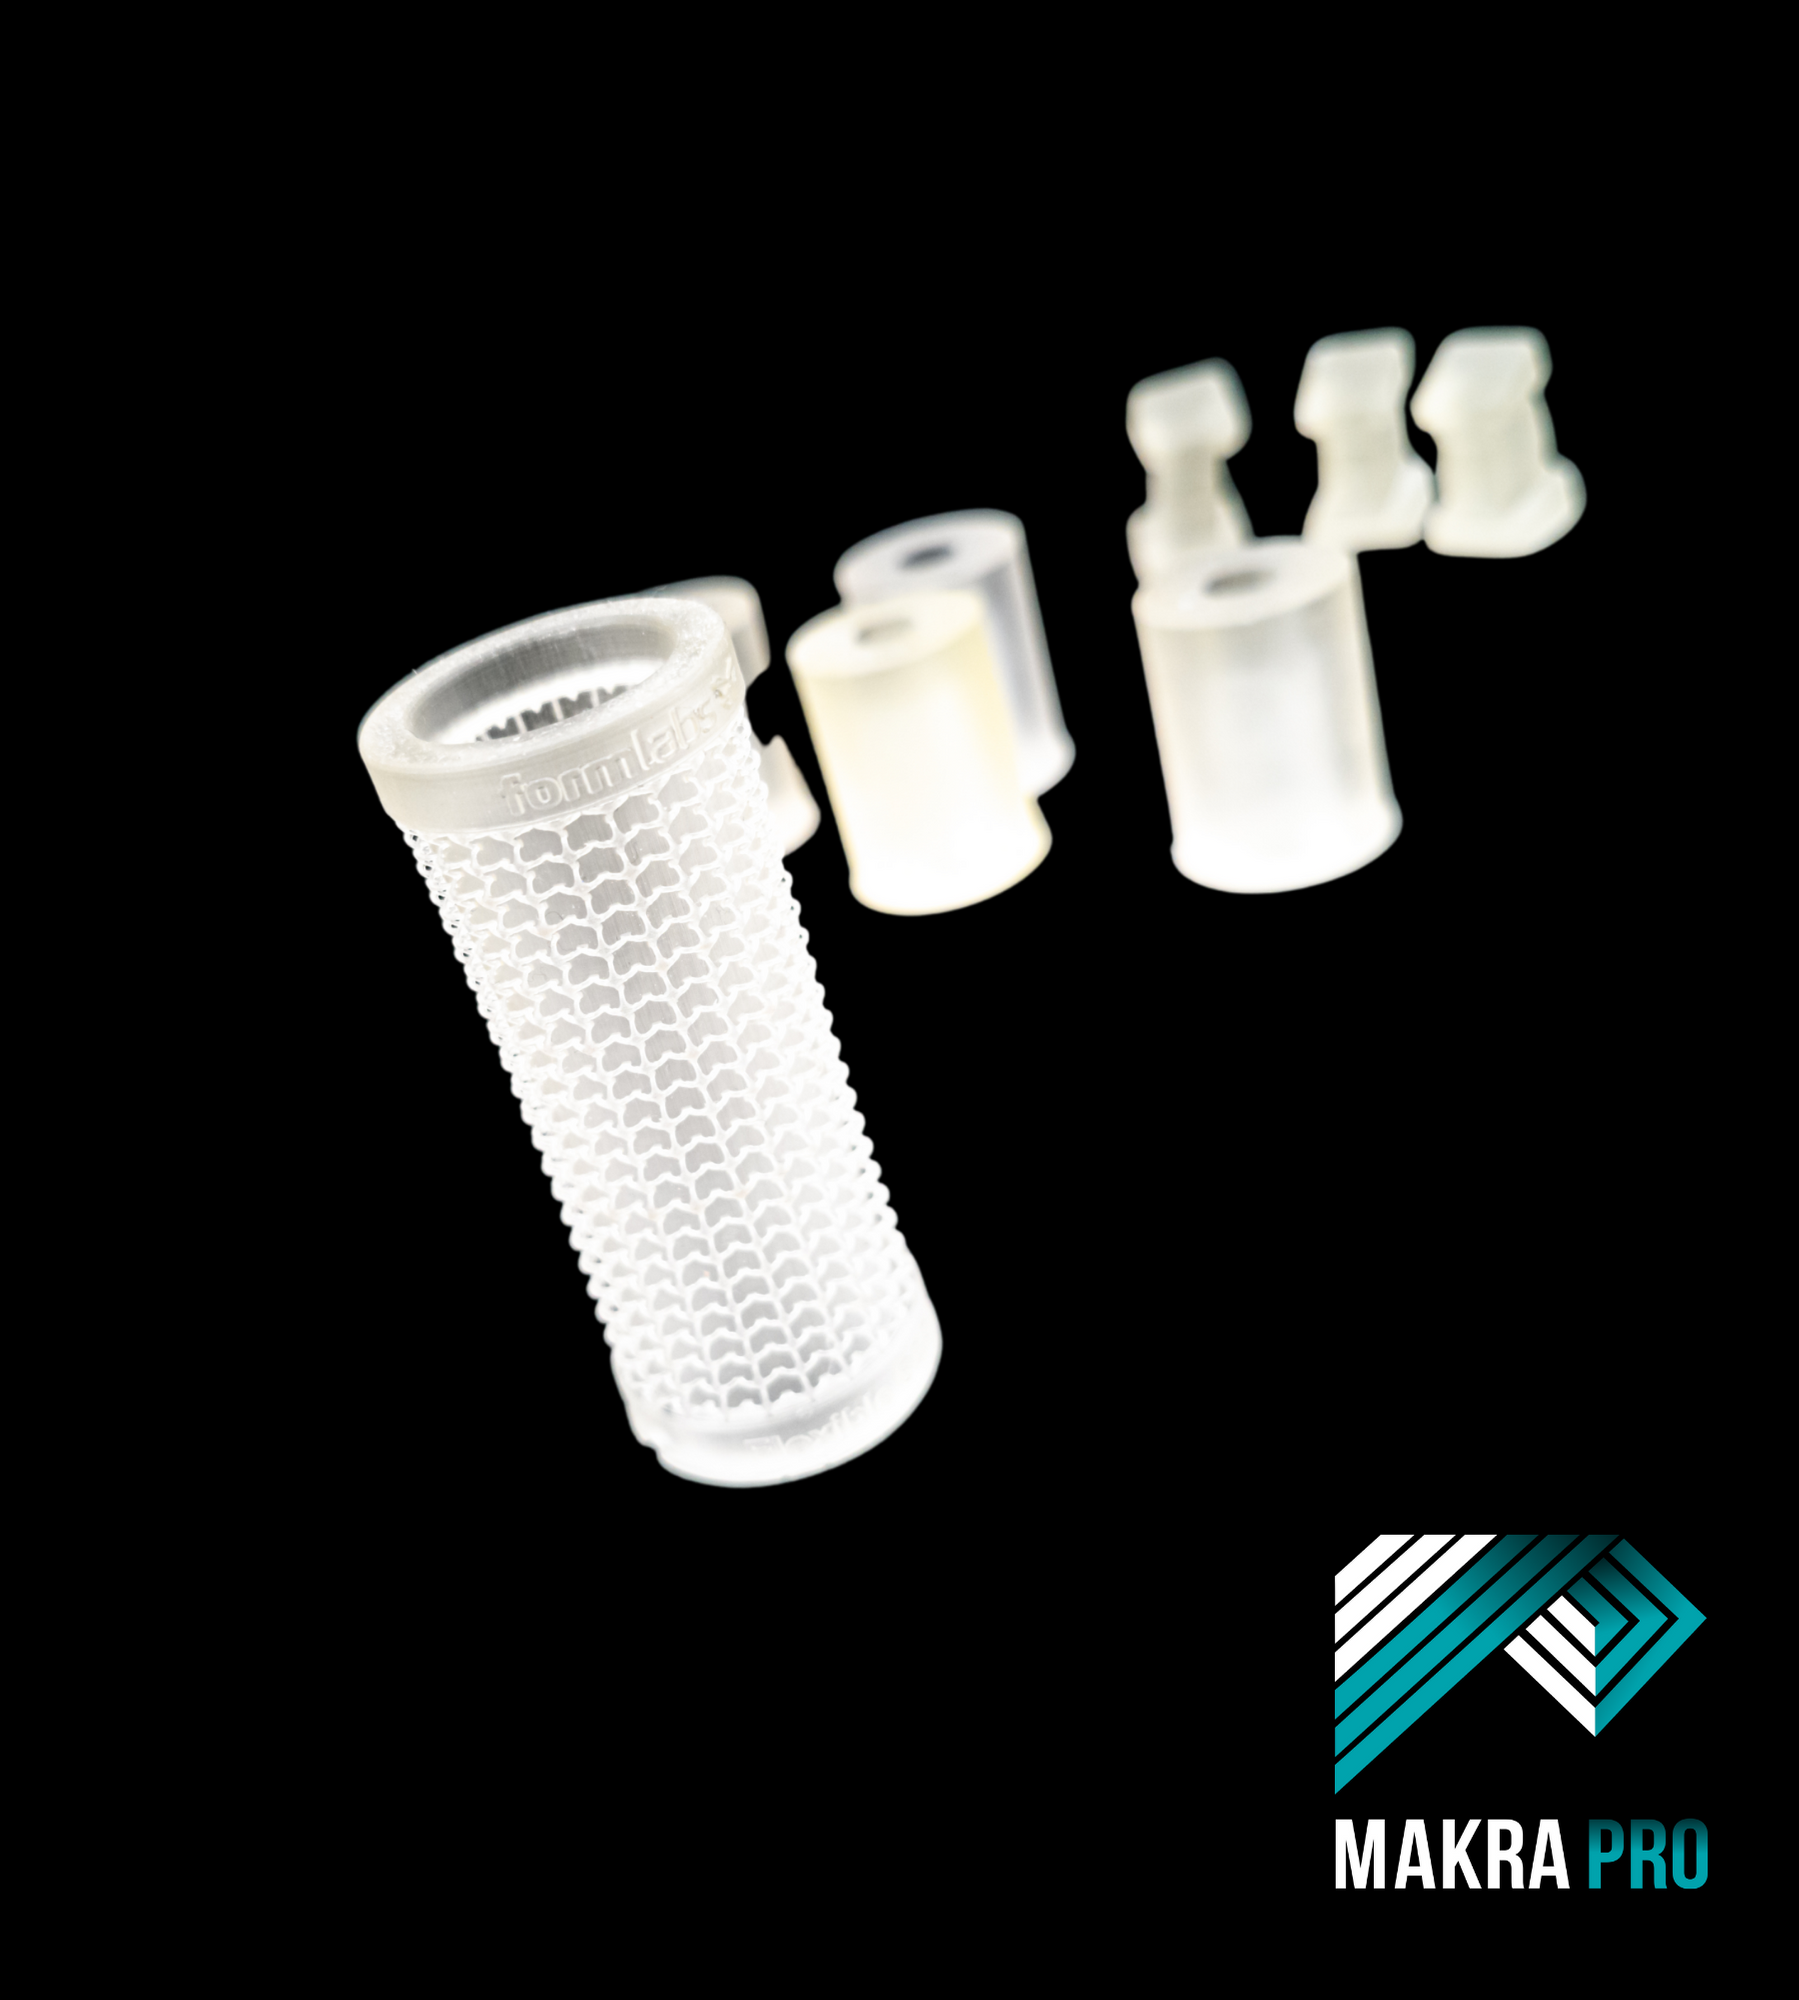 Flexible 3D Druck Makra Pro